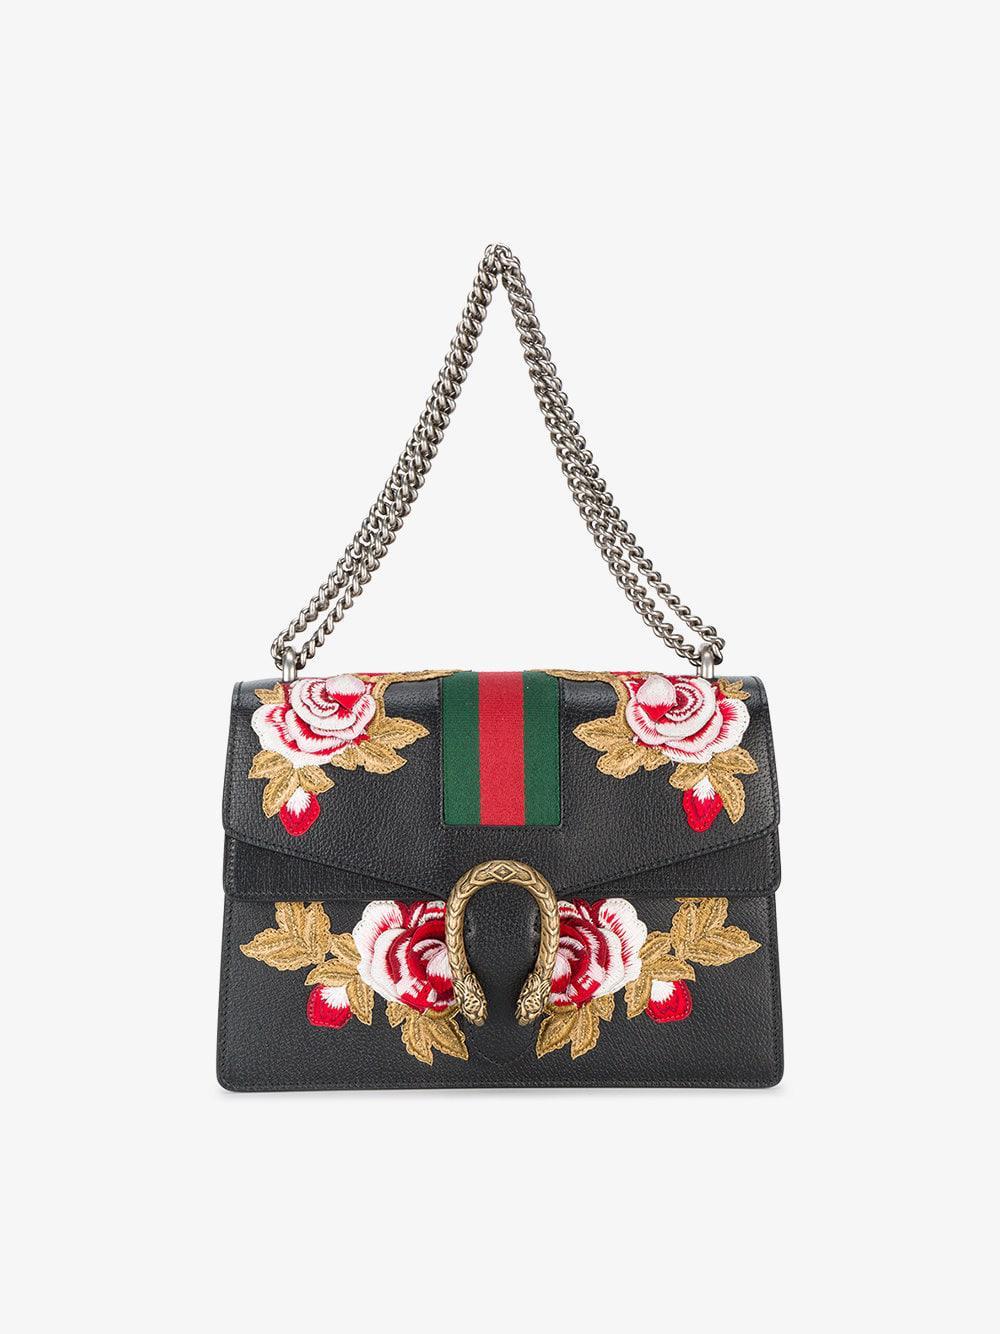 81873d89e5f Lyst - Gucci Dionysus Shoulder Bag in Black